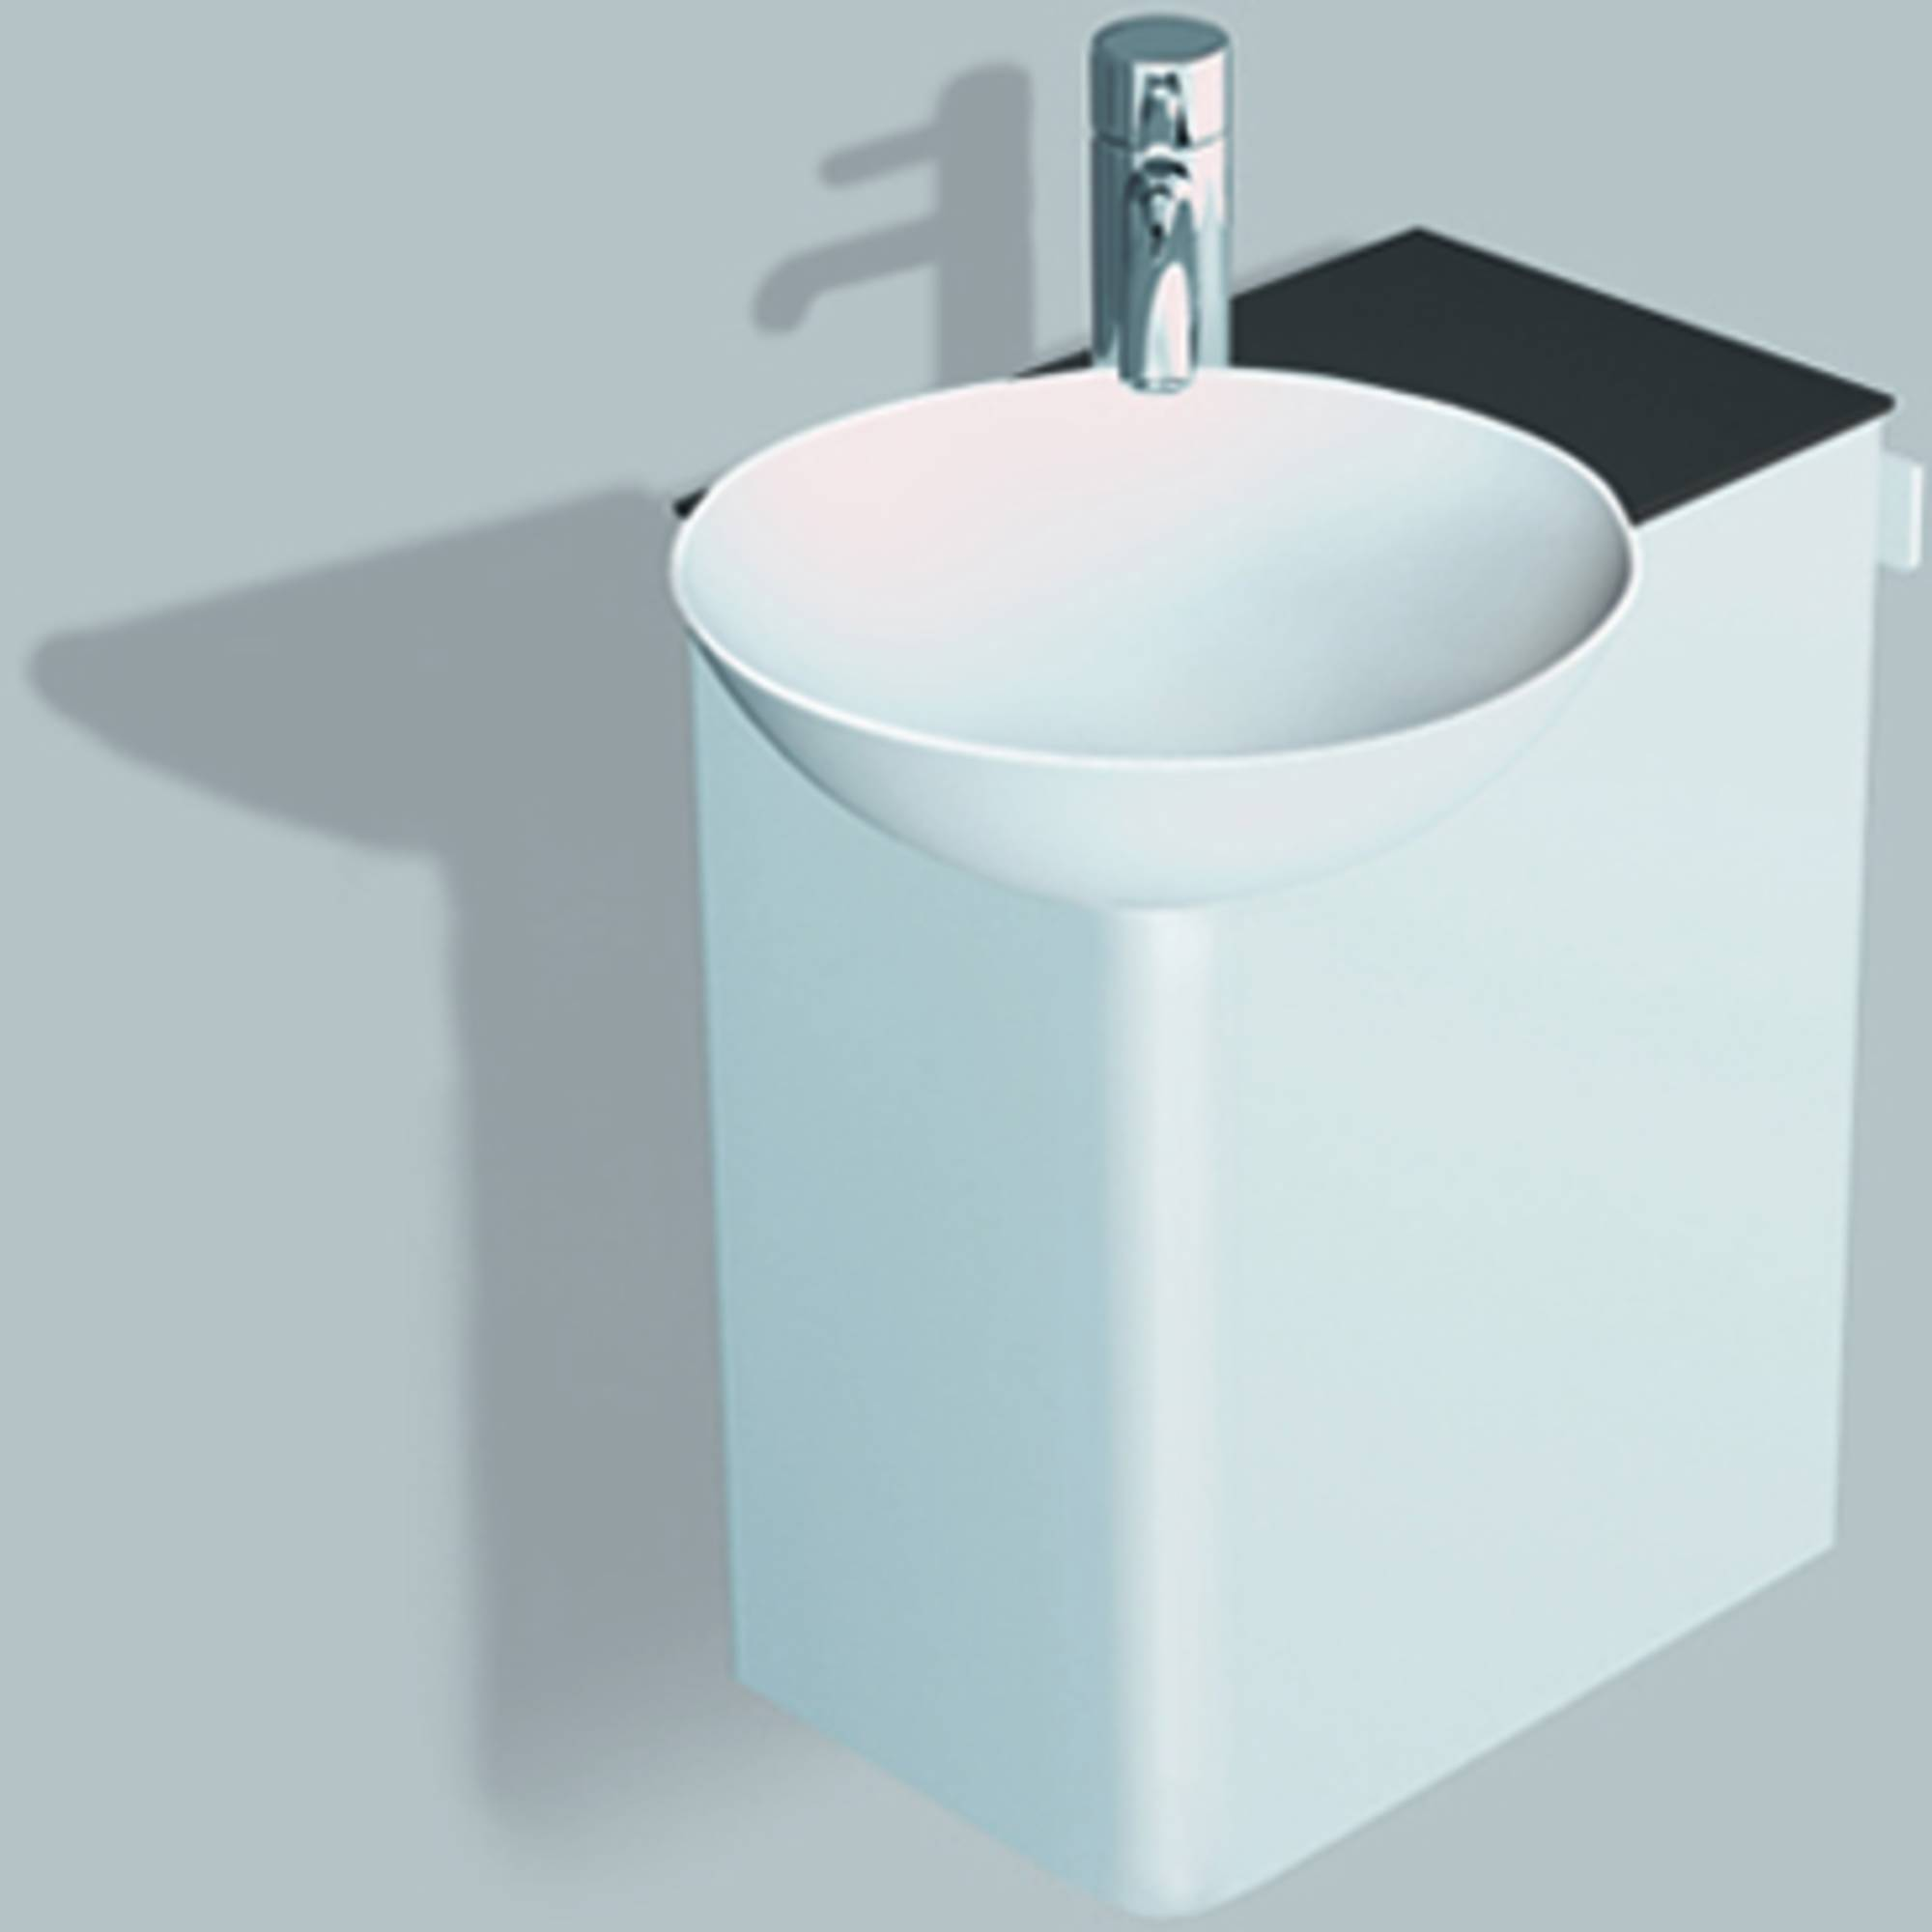 Alape Wp.insert 1 meubelset 48,5cm,wastafel links aflegvlak rechts, wit-antracietbruin